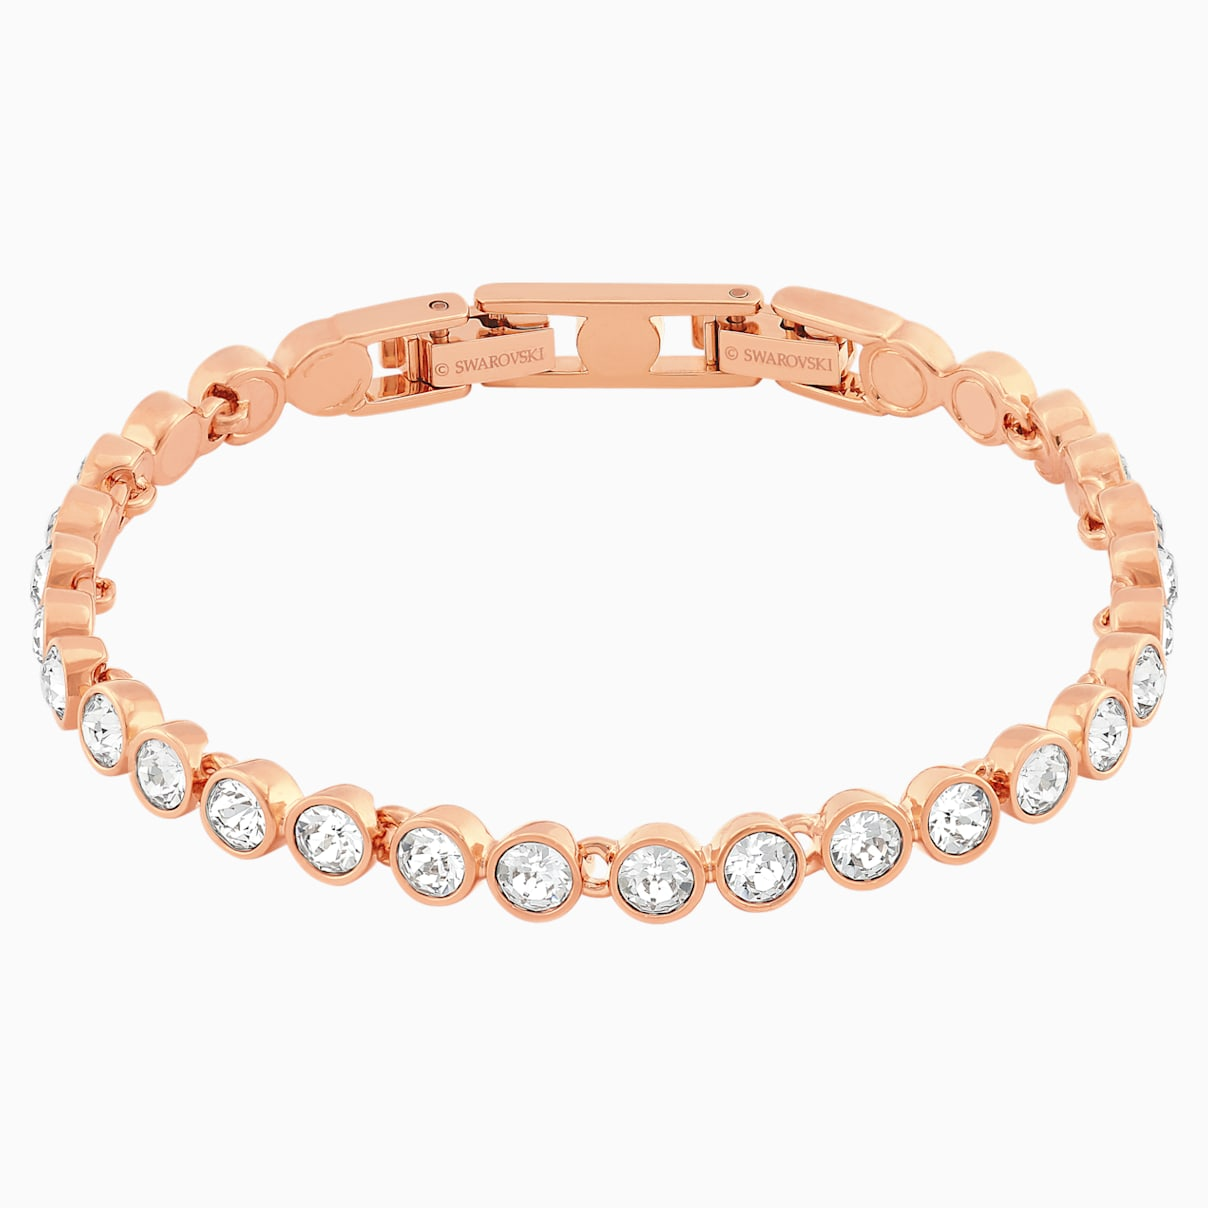 Swarovski Tennis Bracelet, White, Rose-gold tone plated